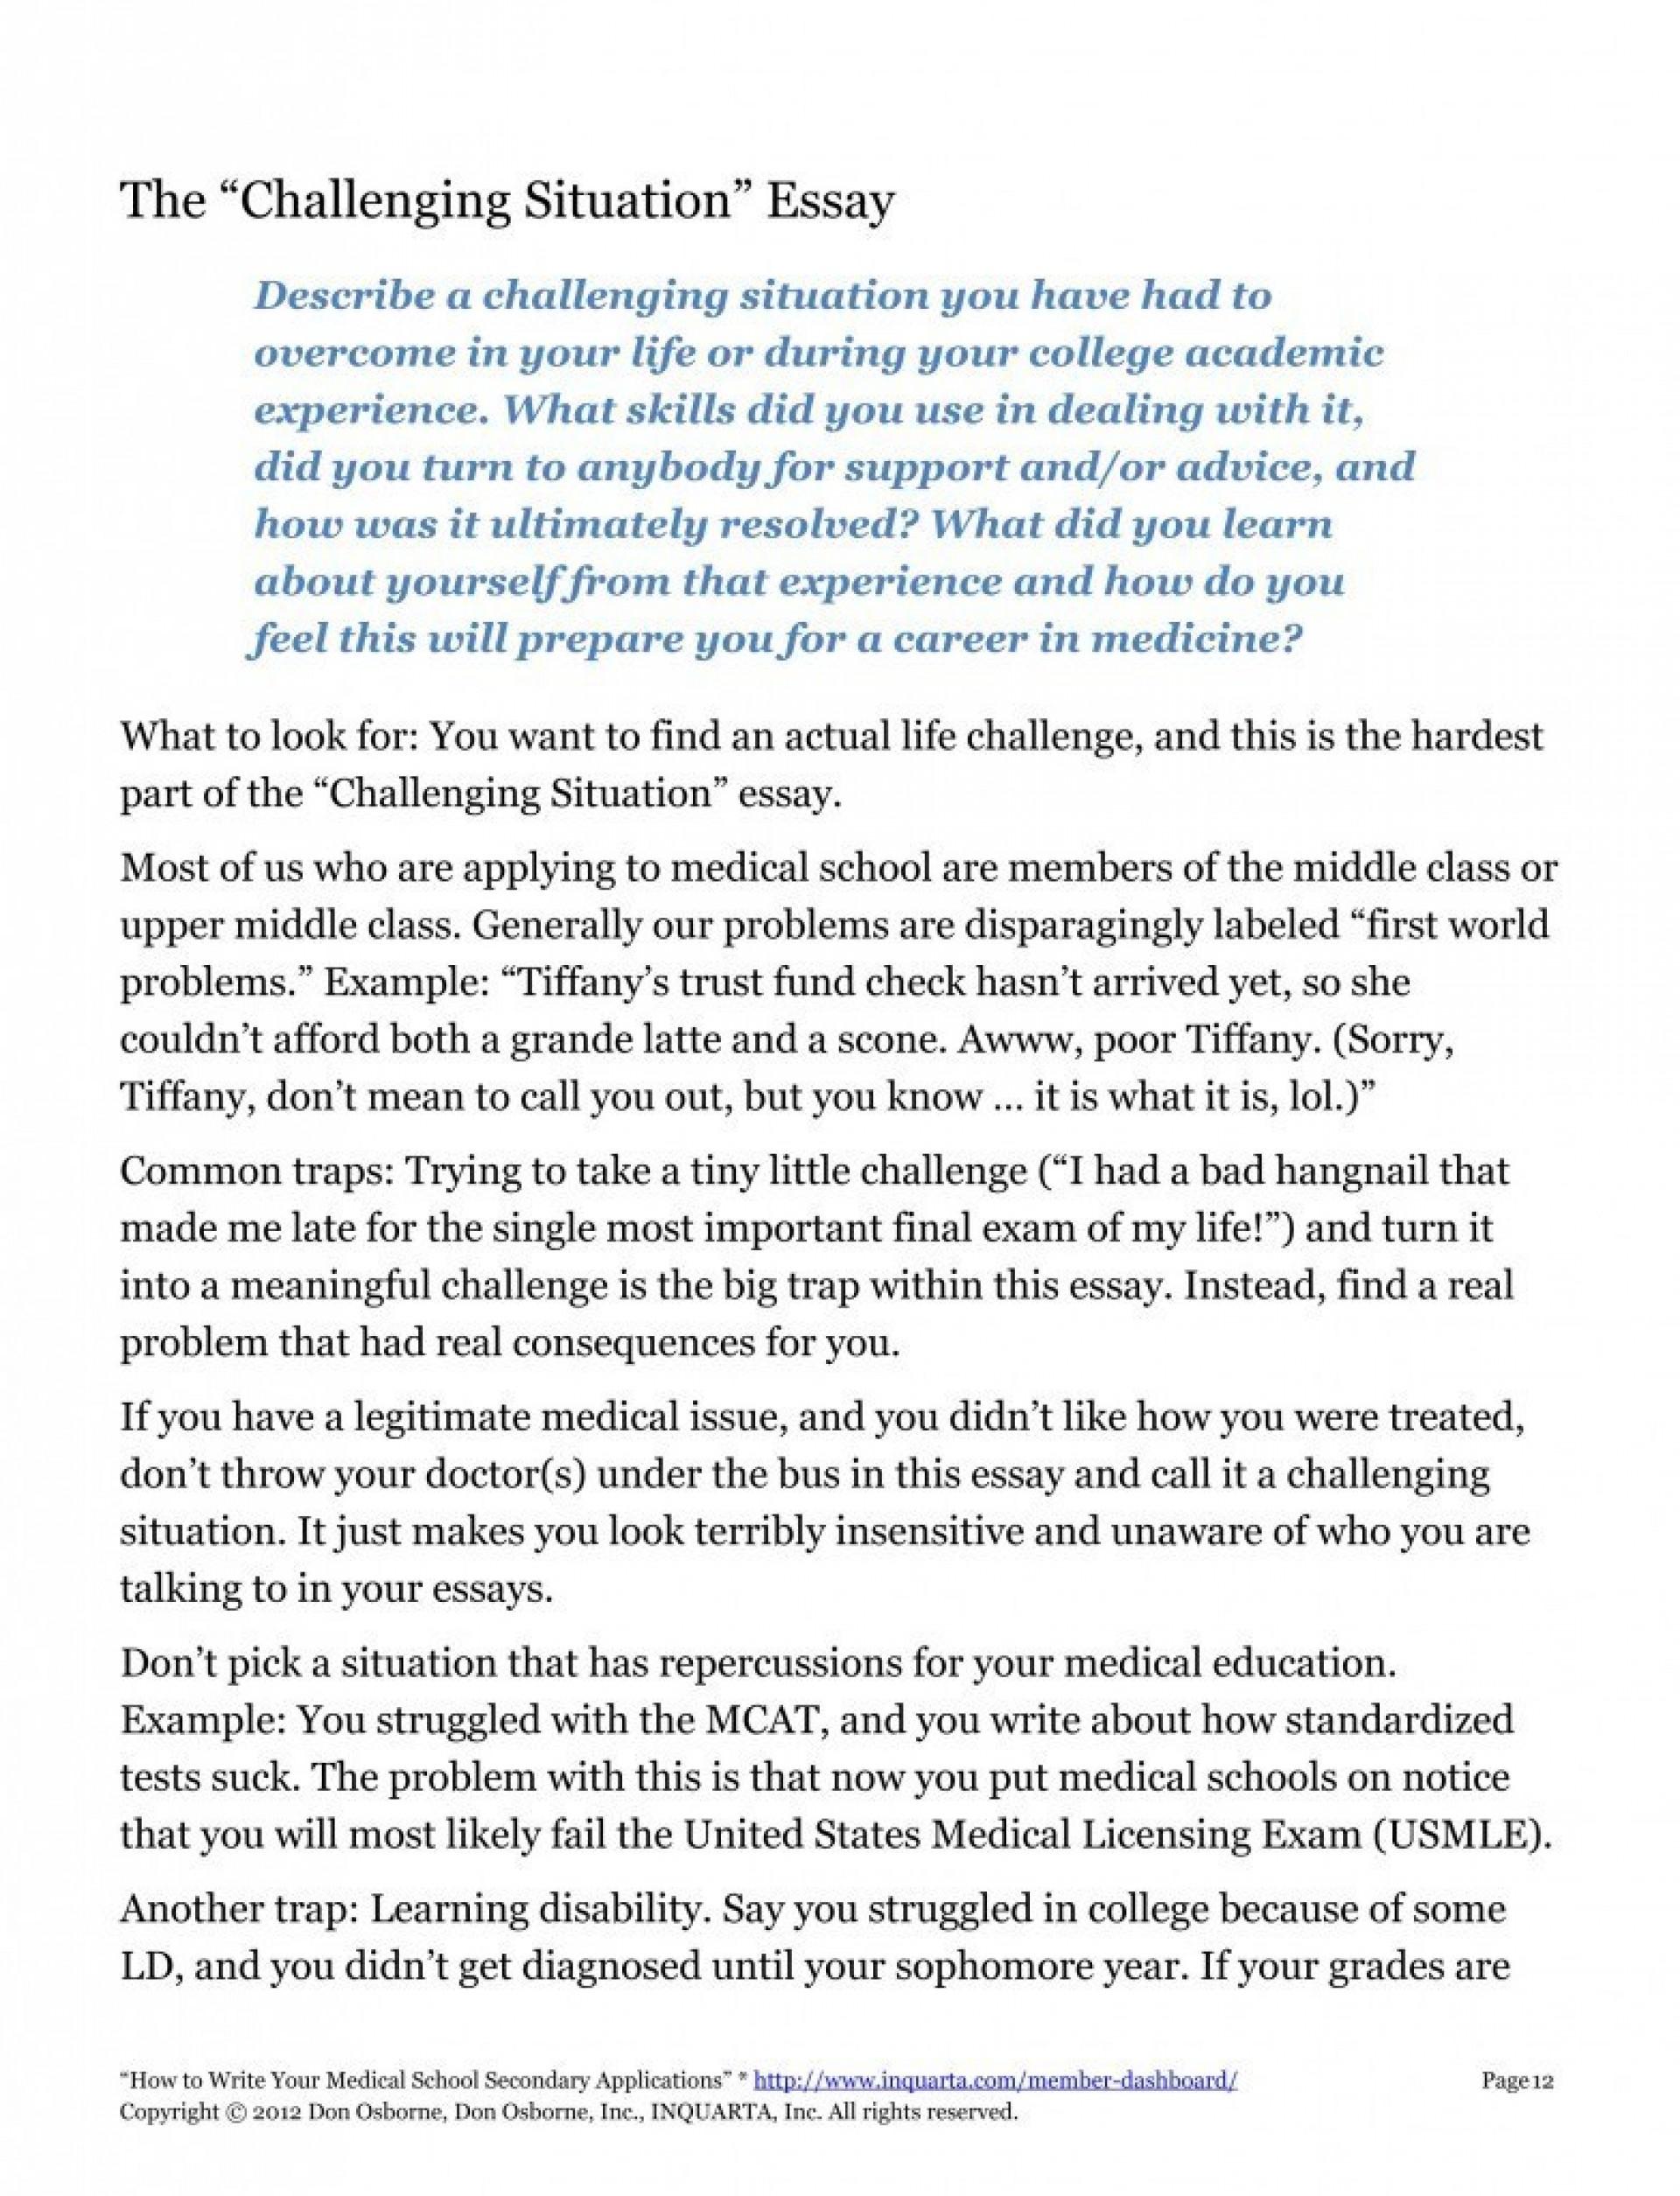 007 Medschoolsecondaries Spyshot1 783x1024 Diversity Essay Sample Fascinating Law School 1920